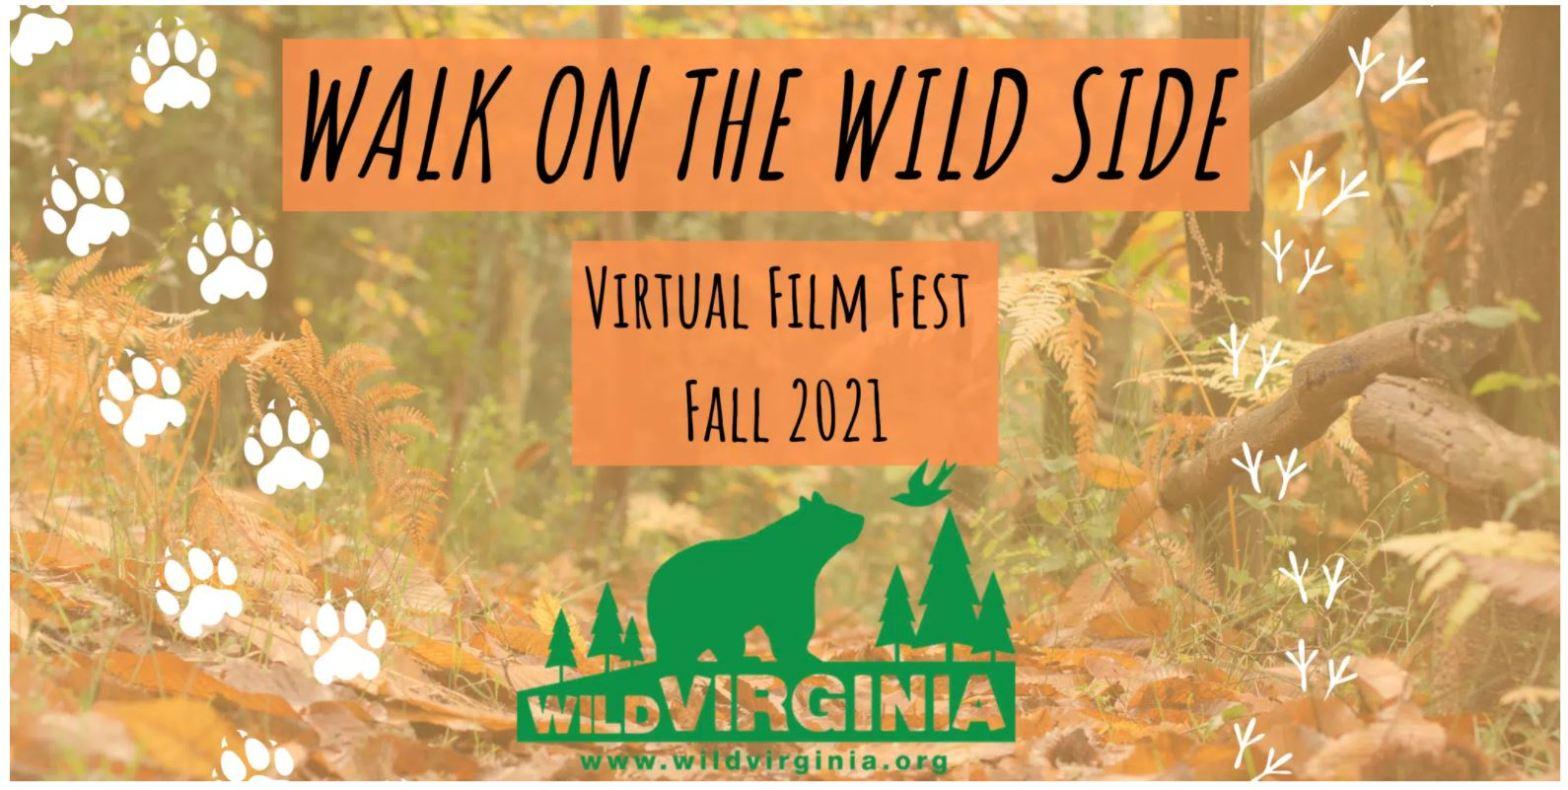 Wild Virginia Walk on the Wild Side Virtual Film Fest 2021